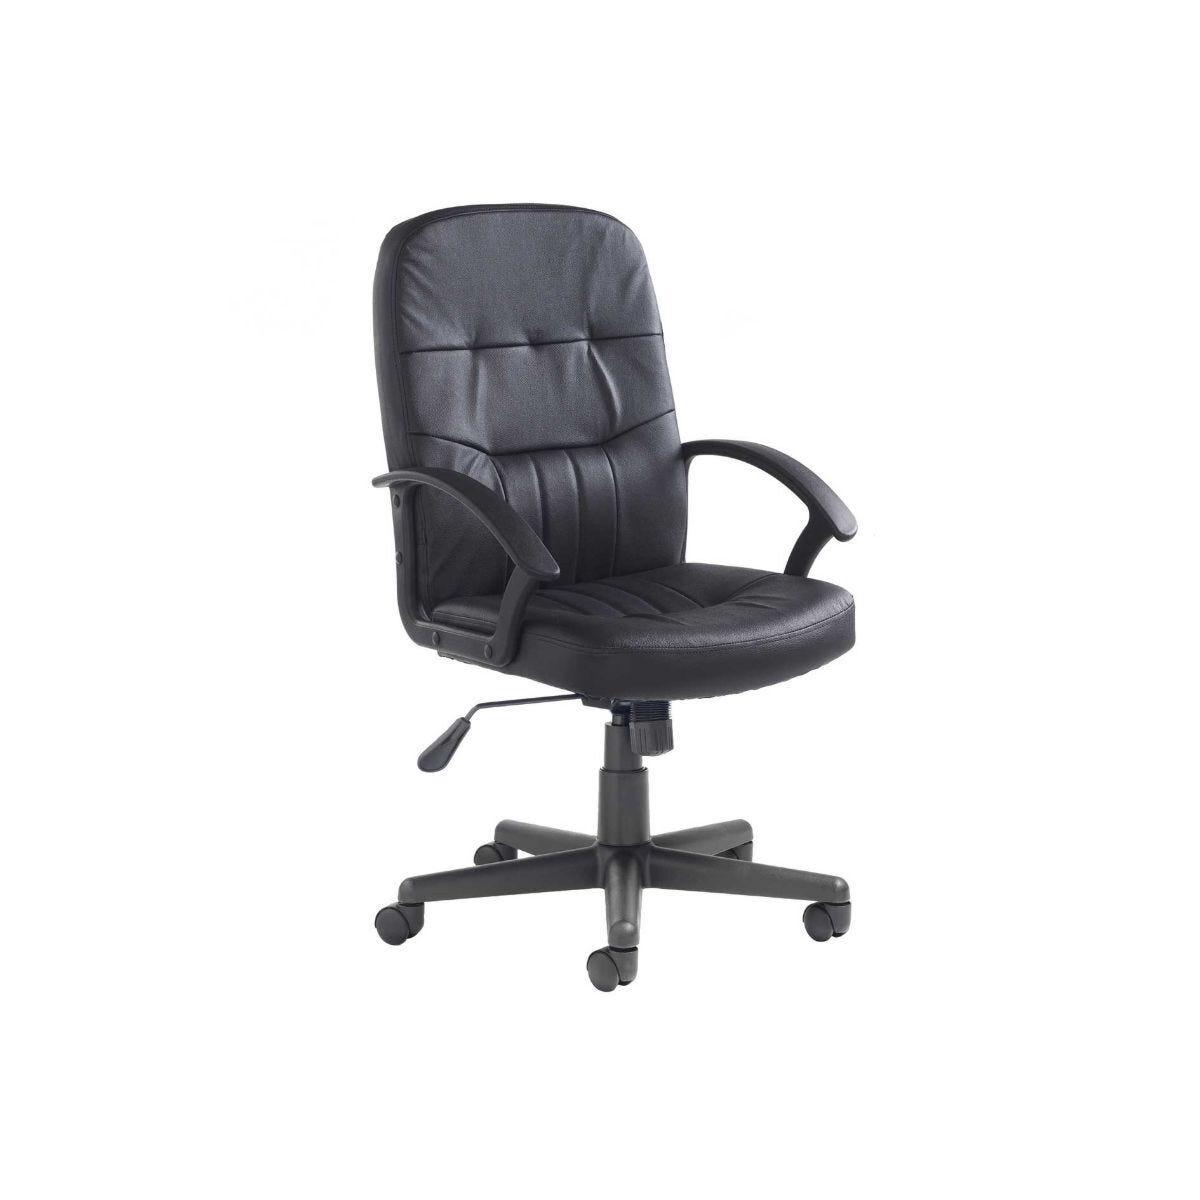 Cavalier Leather Faced Office Chair